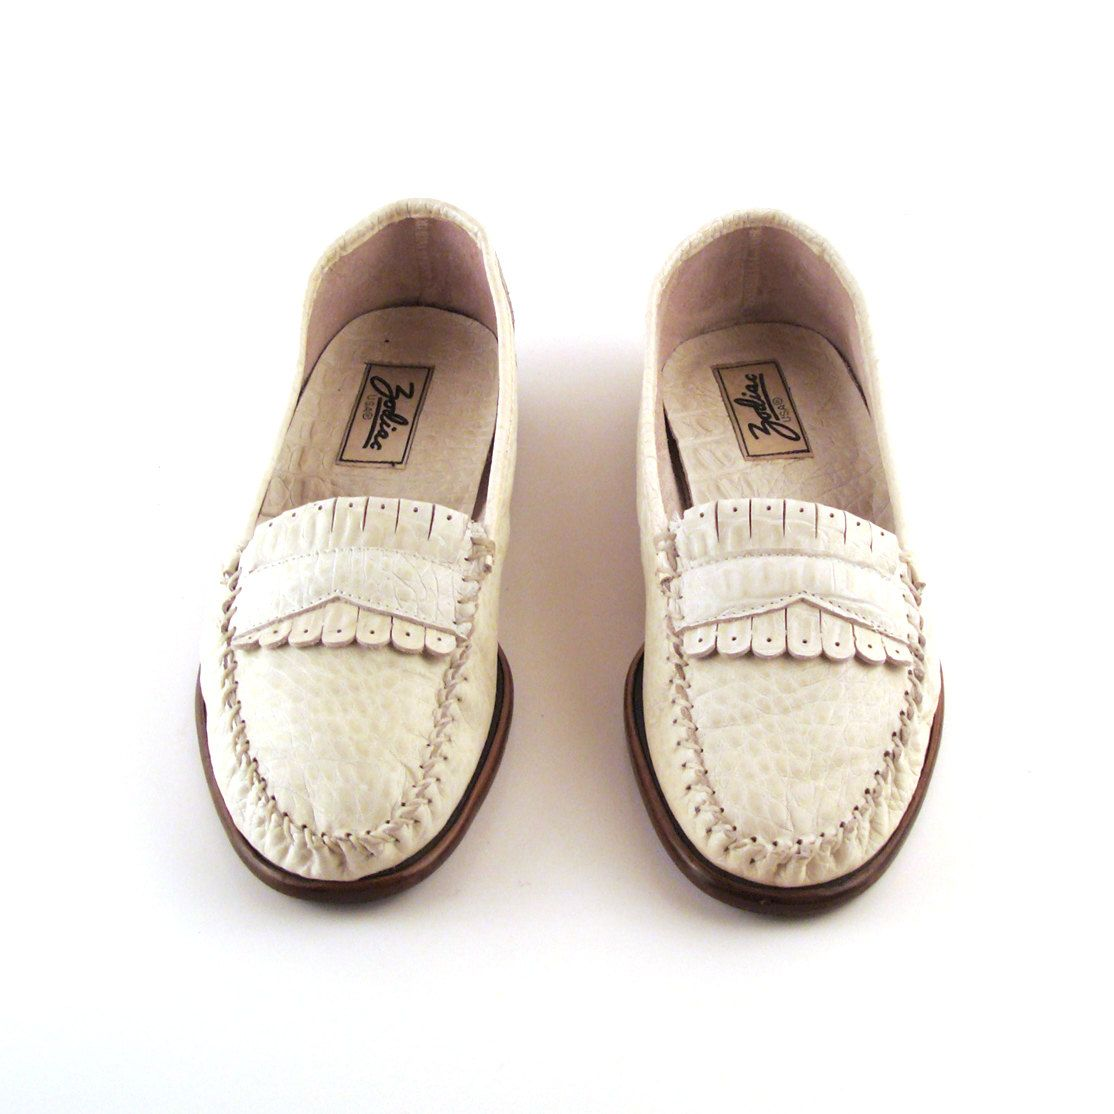 c79e1dd2a2a Zodiac White Loafers Vintage 1980s Mens Shoes Size 9 1 2